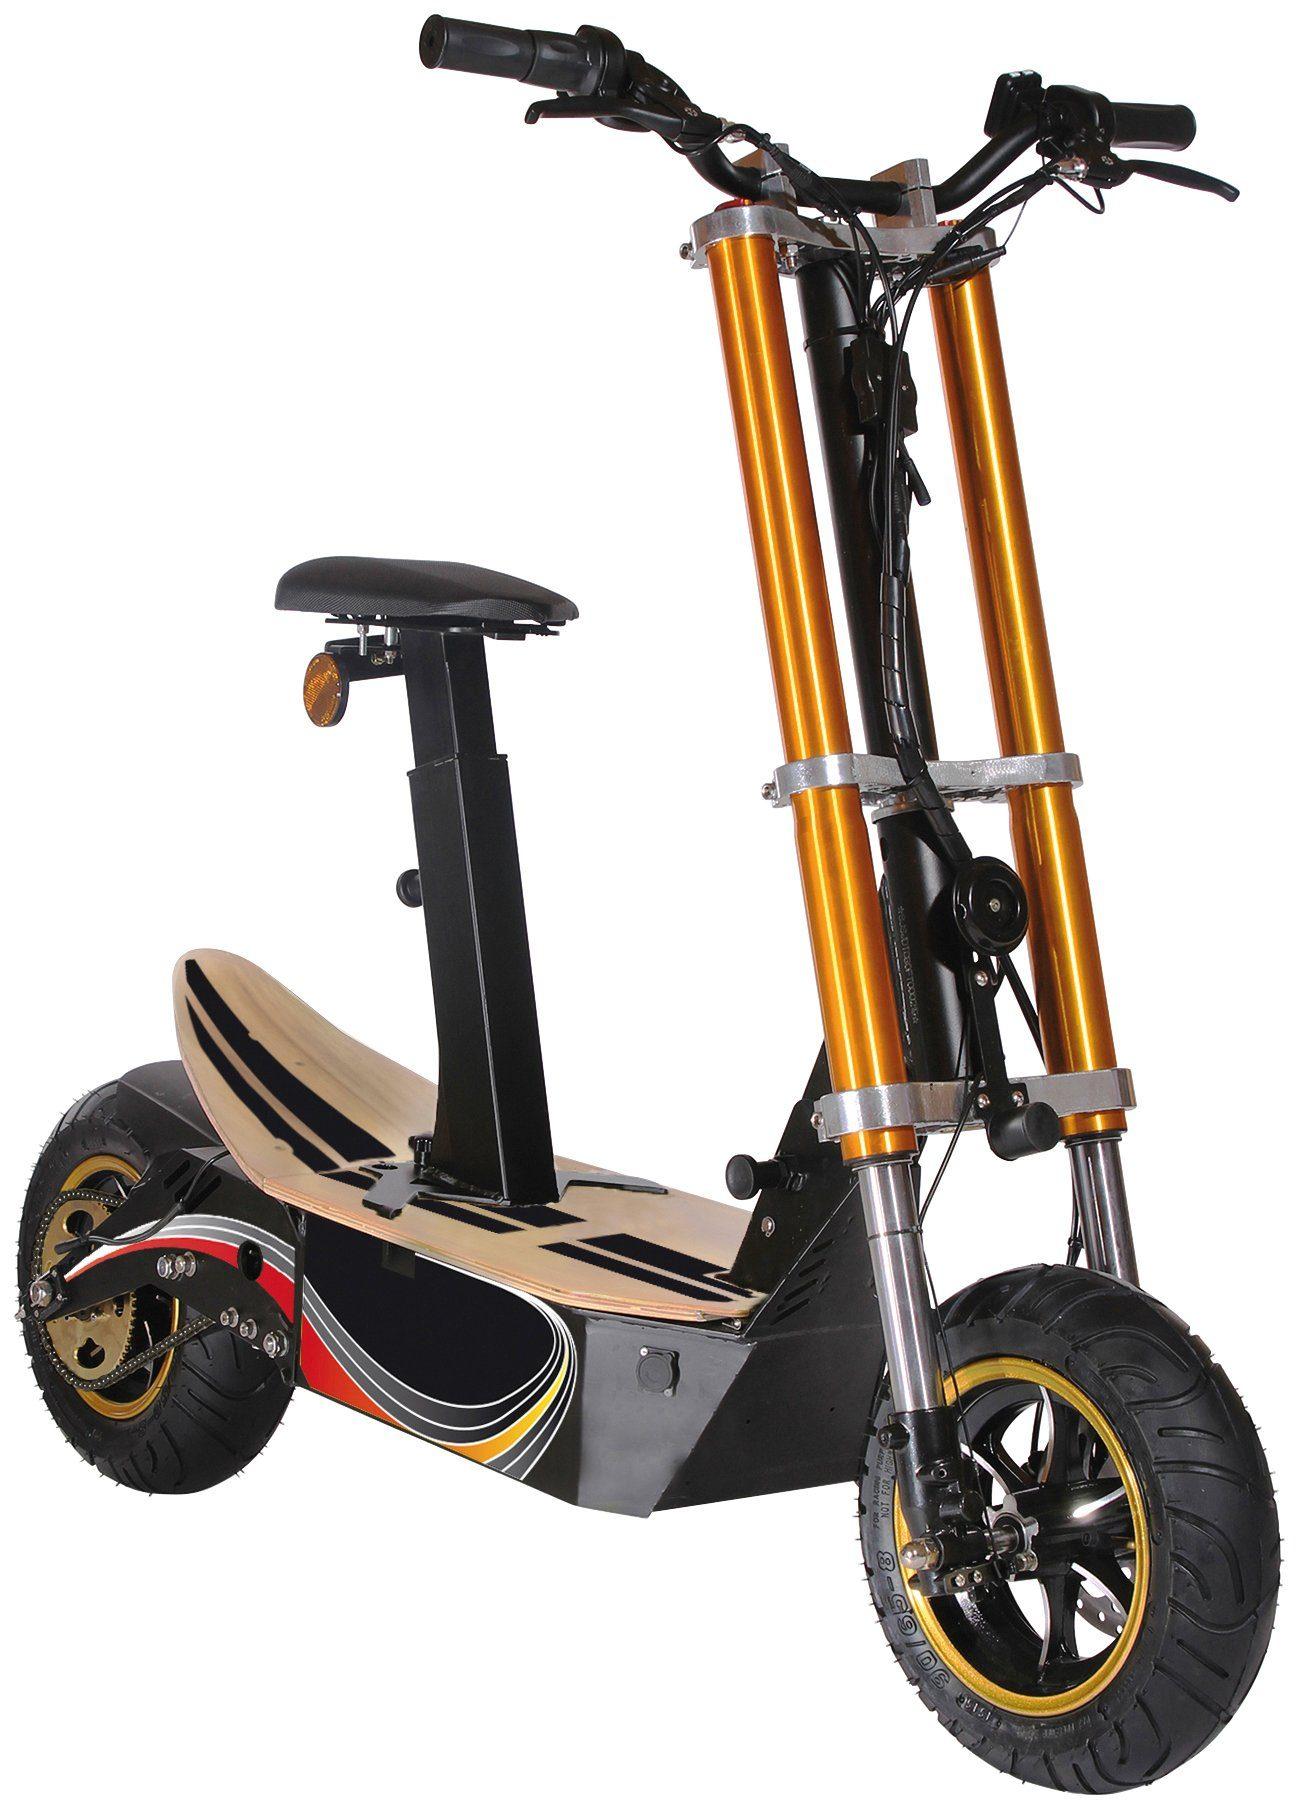 E-Scooter »Bossman 2 RSP«, 45 km/h, Inkl. Rundum-Sorglos-Paket